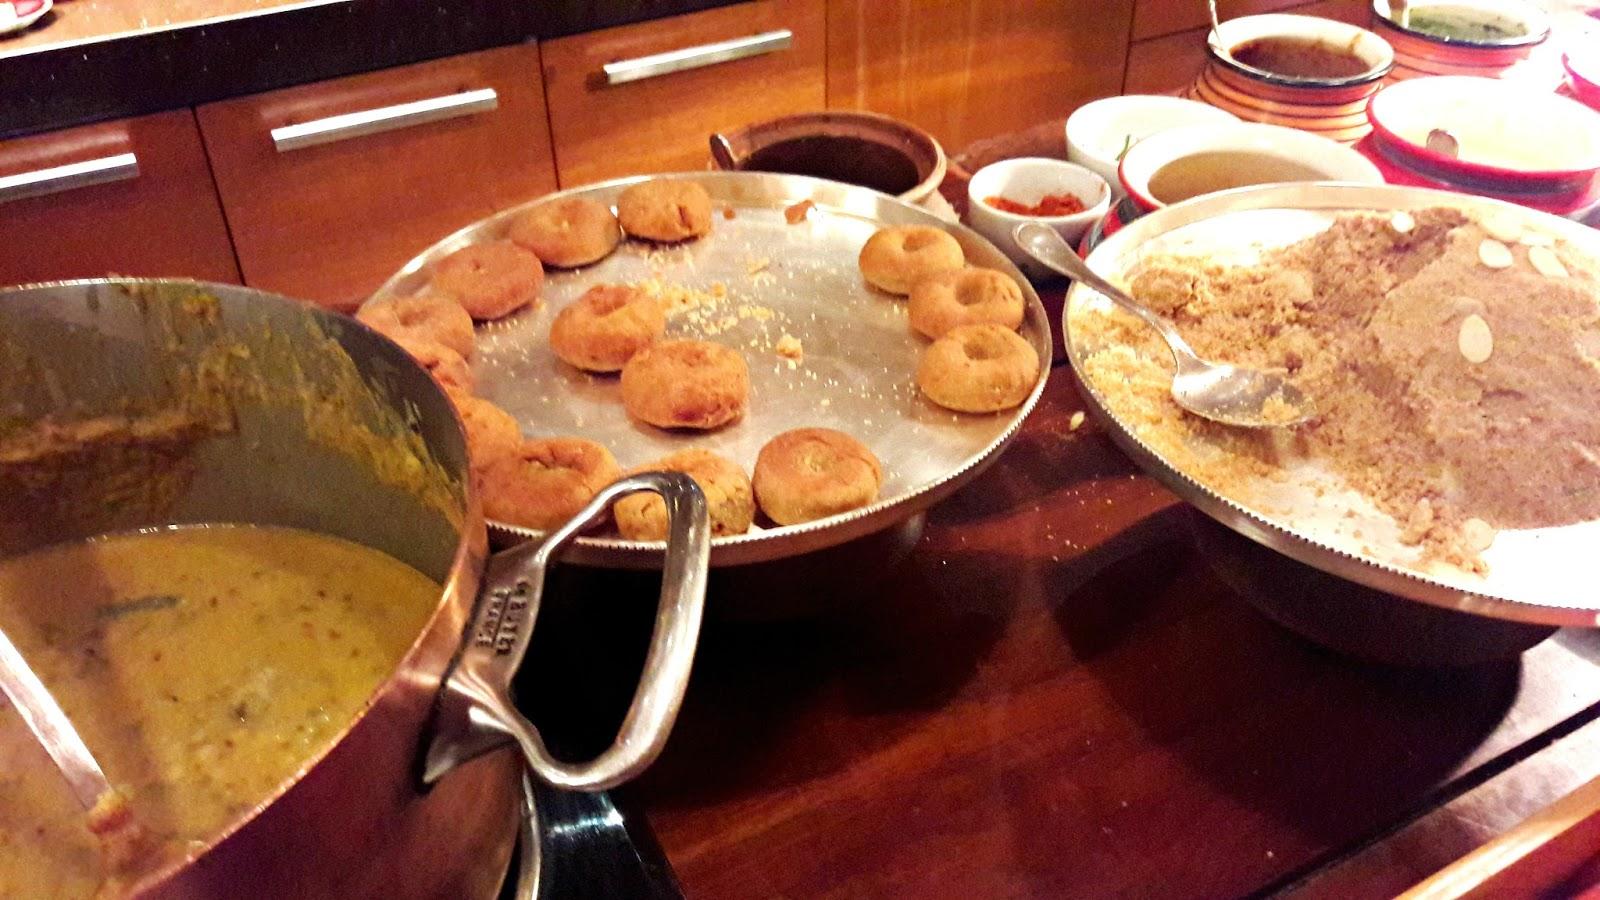 Marwari Food Fest at The Dining Room, PHC | Bake Tales